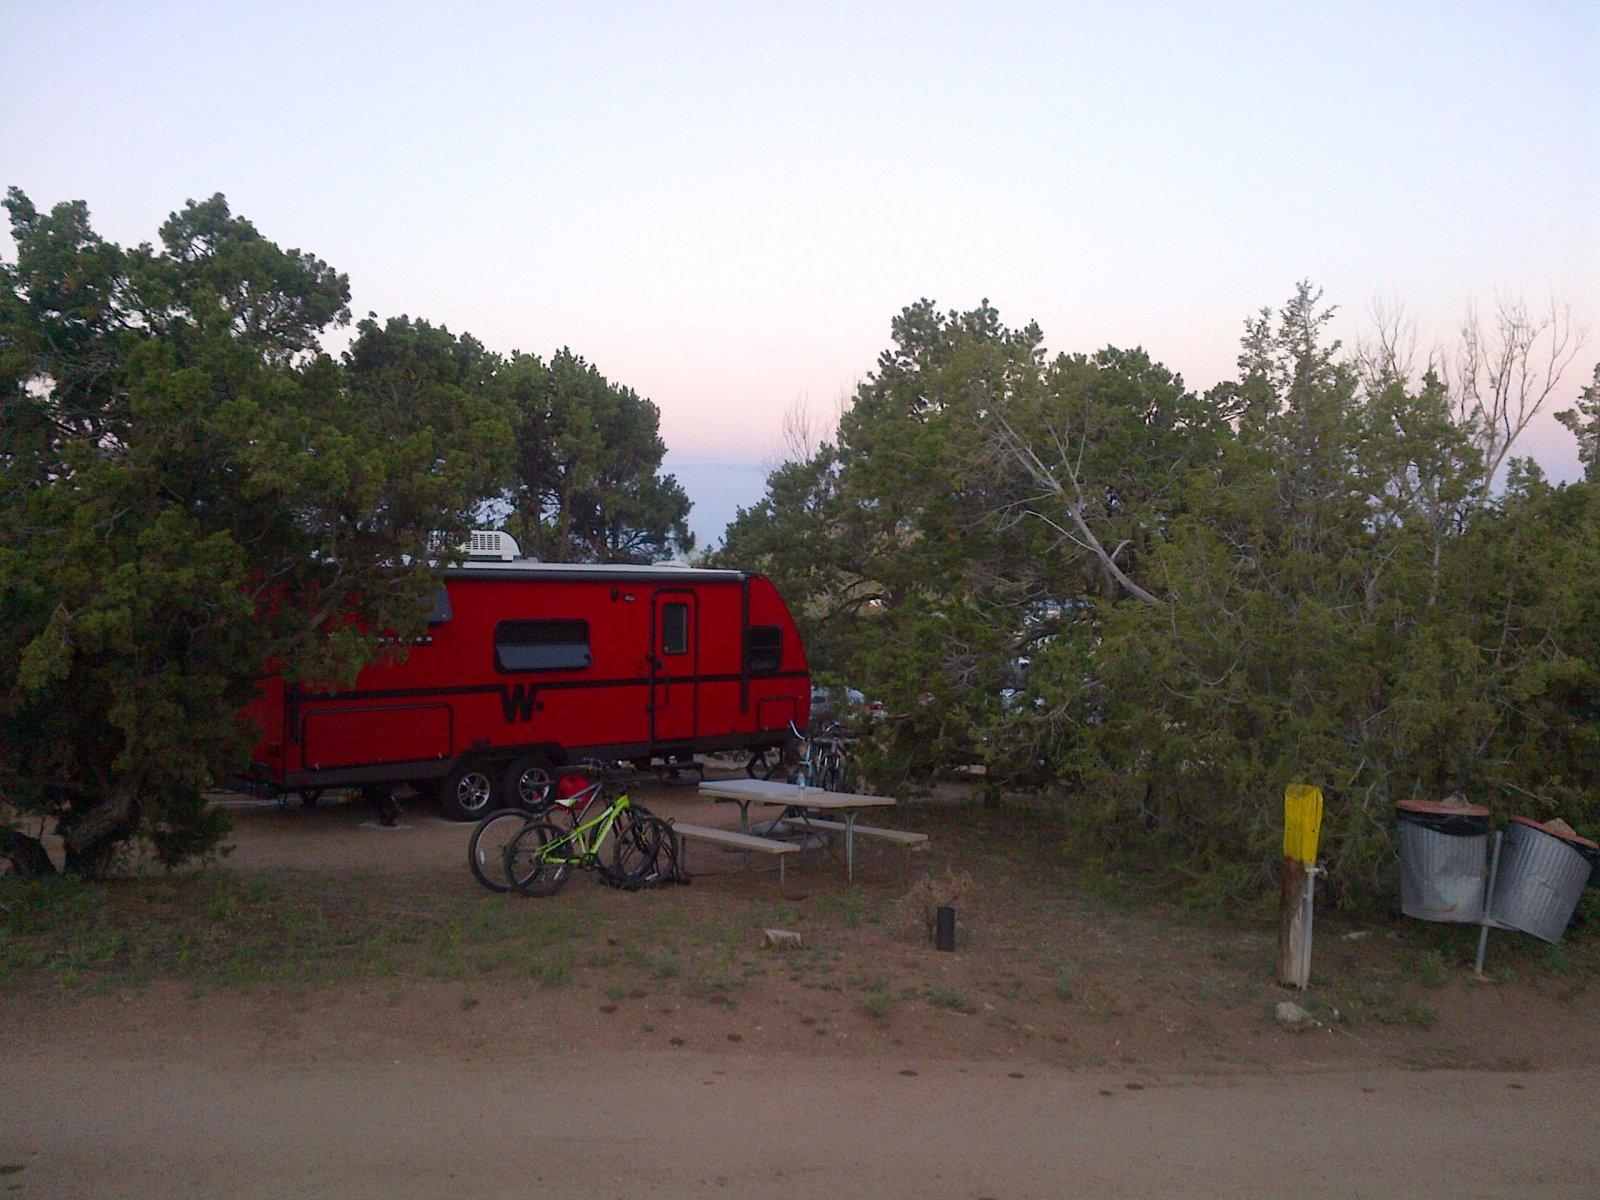 Click image for larger version  Name:Santa Fe South-20140529-00986.jpg Views:240 Size:316.8 KB ID:65831